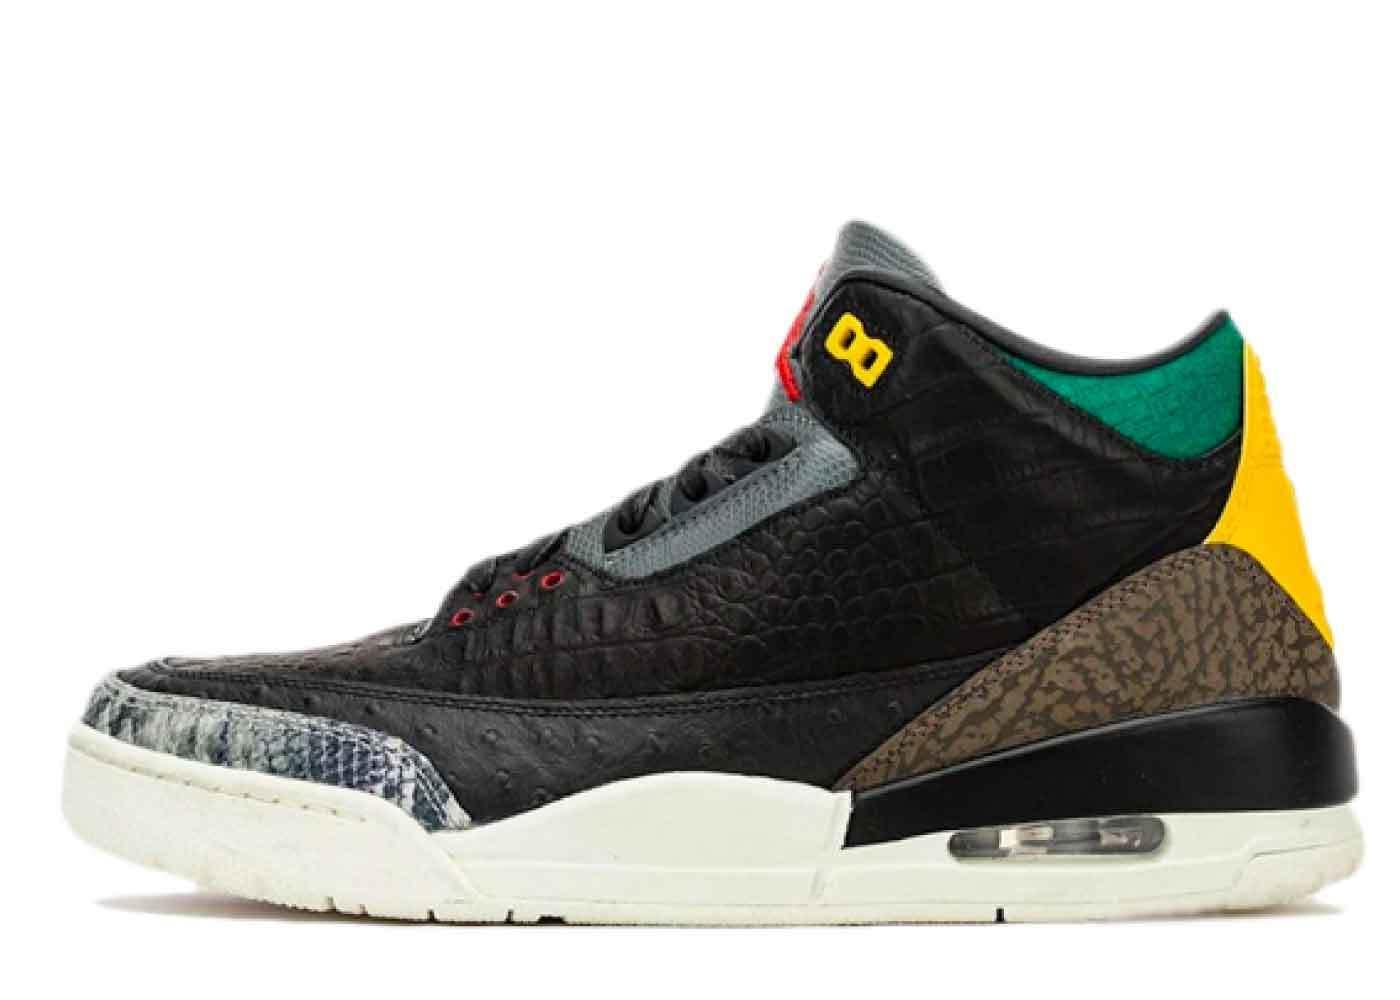 Nike Air Jordan 3 Retro SE QS Animal Instinct 2.0の写真